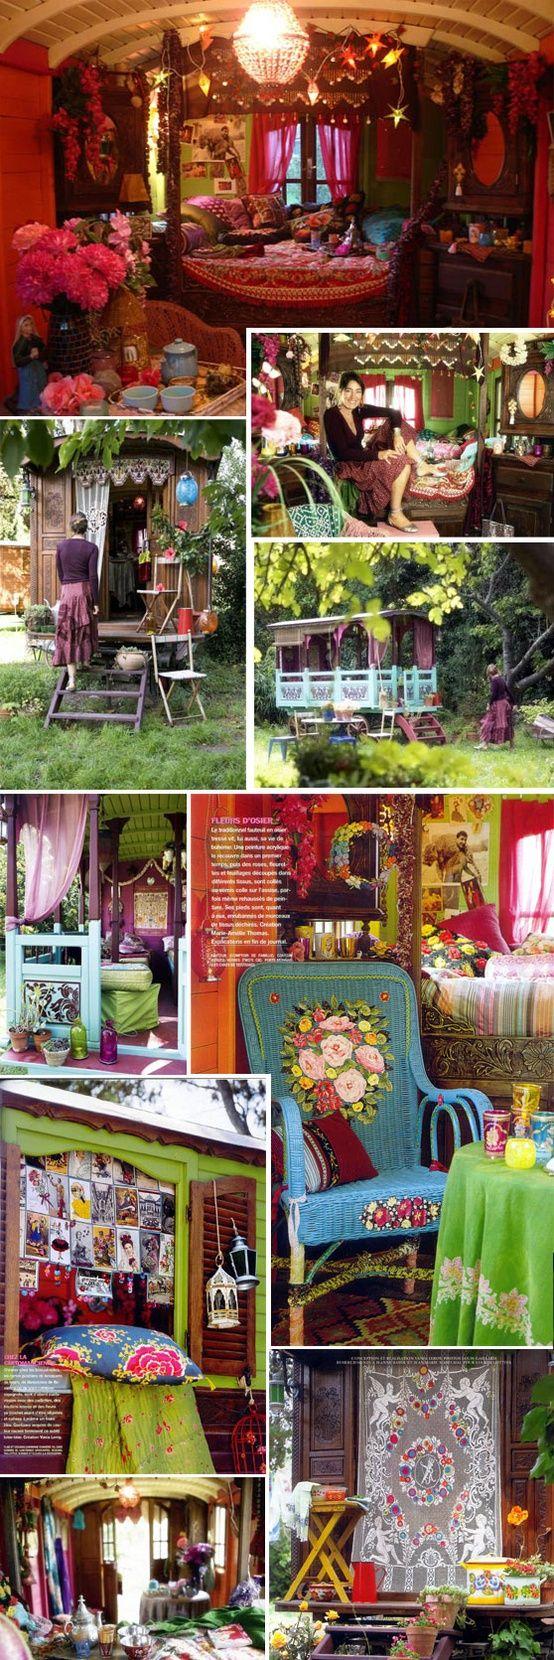 Gypsie decor gitano estilo gitano y decoraci n for Muebles gitanos